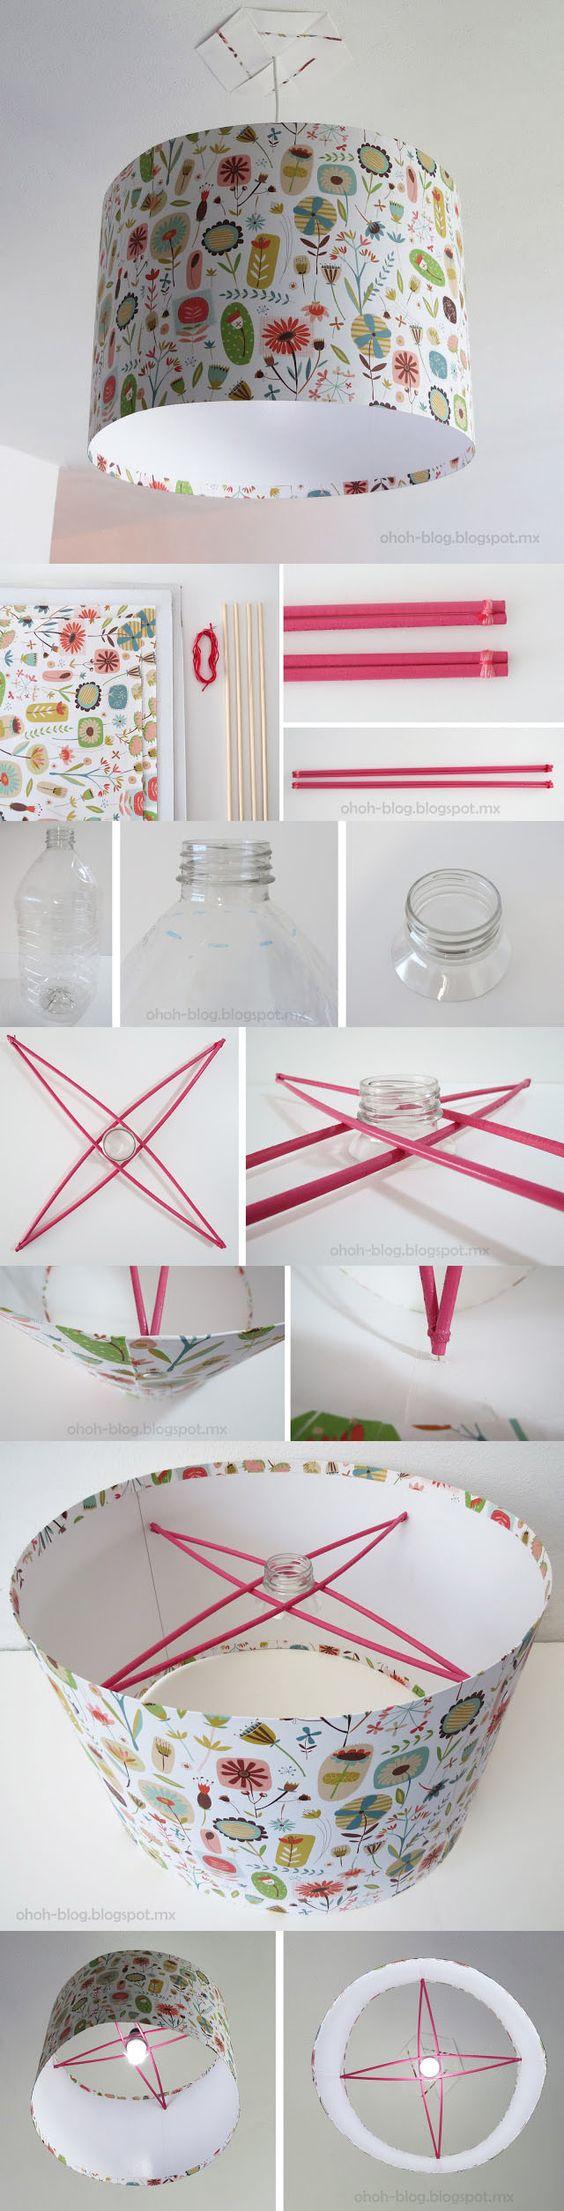 lampara-reciclaje-muy-ingenioso: